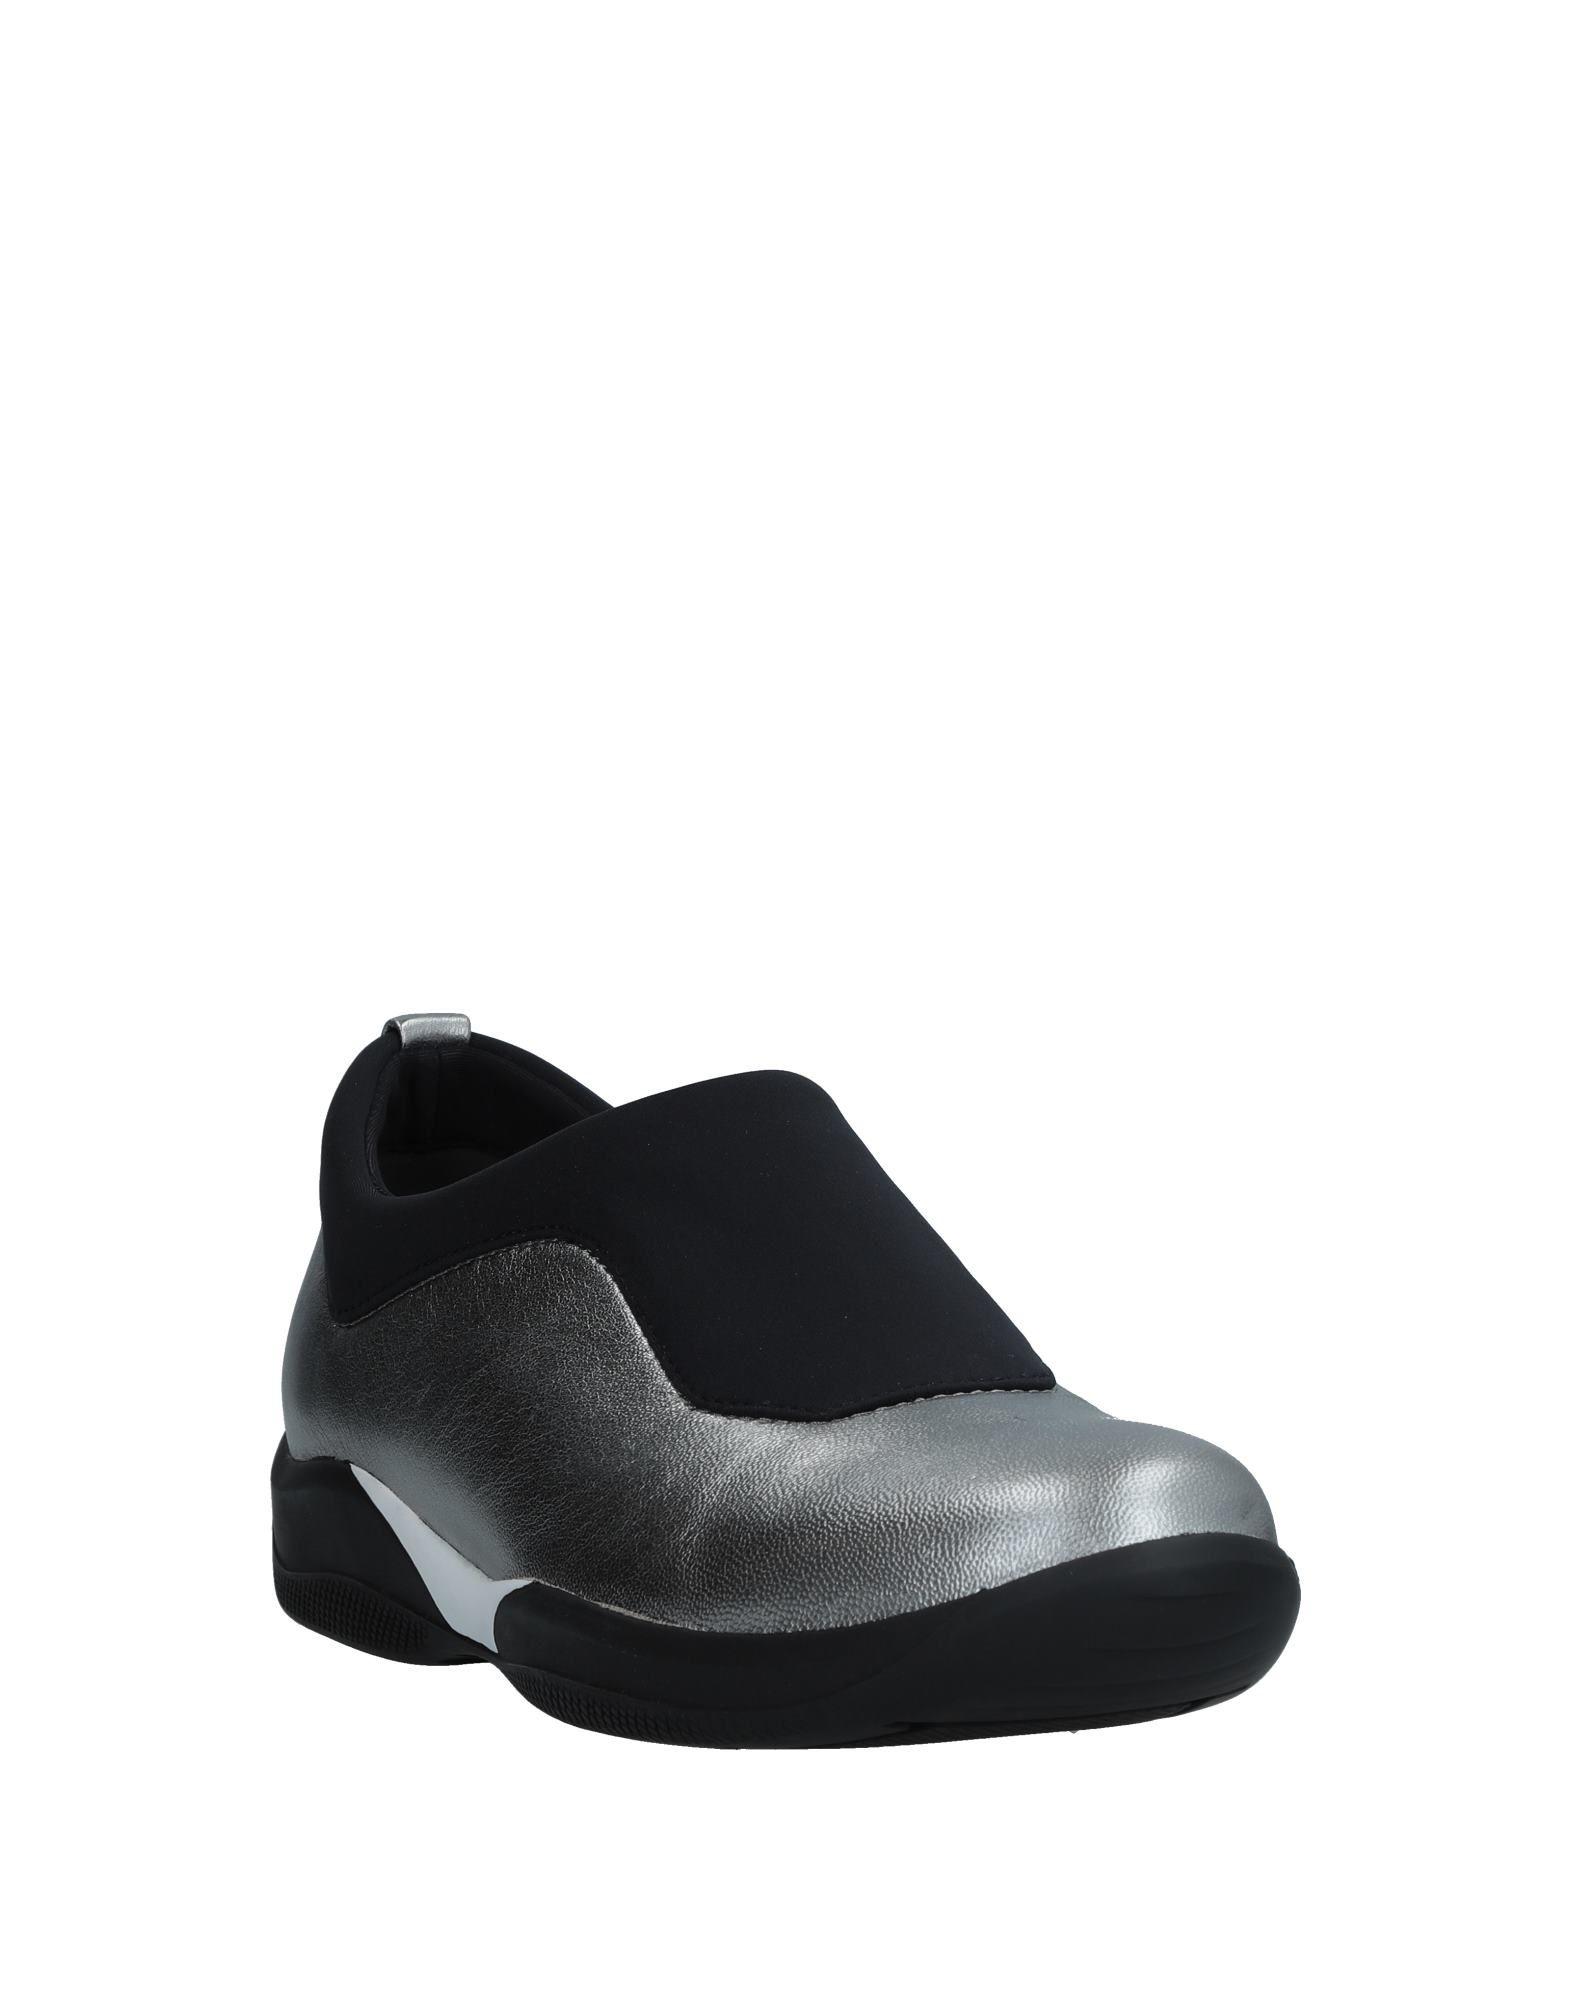 Prada Sport Sport Prada Sneakers Damen  11543502IN Beliebte Schuhe 604bf2